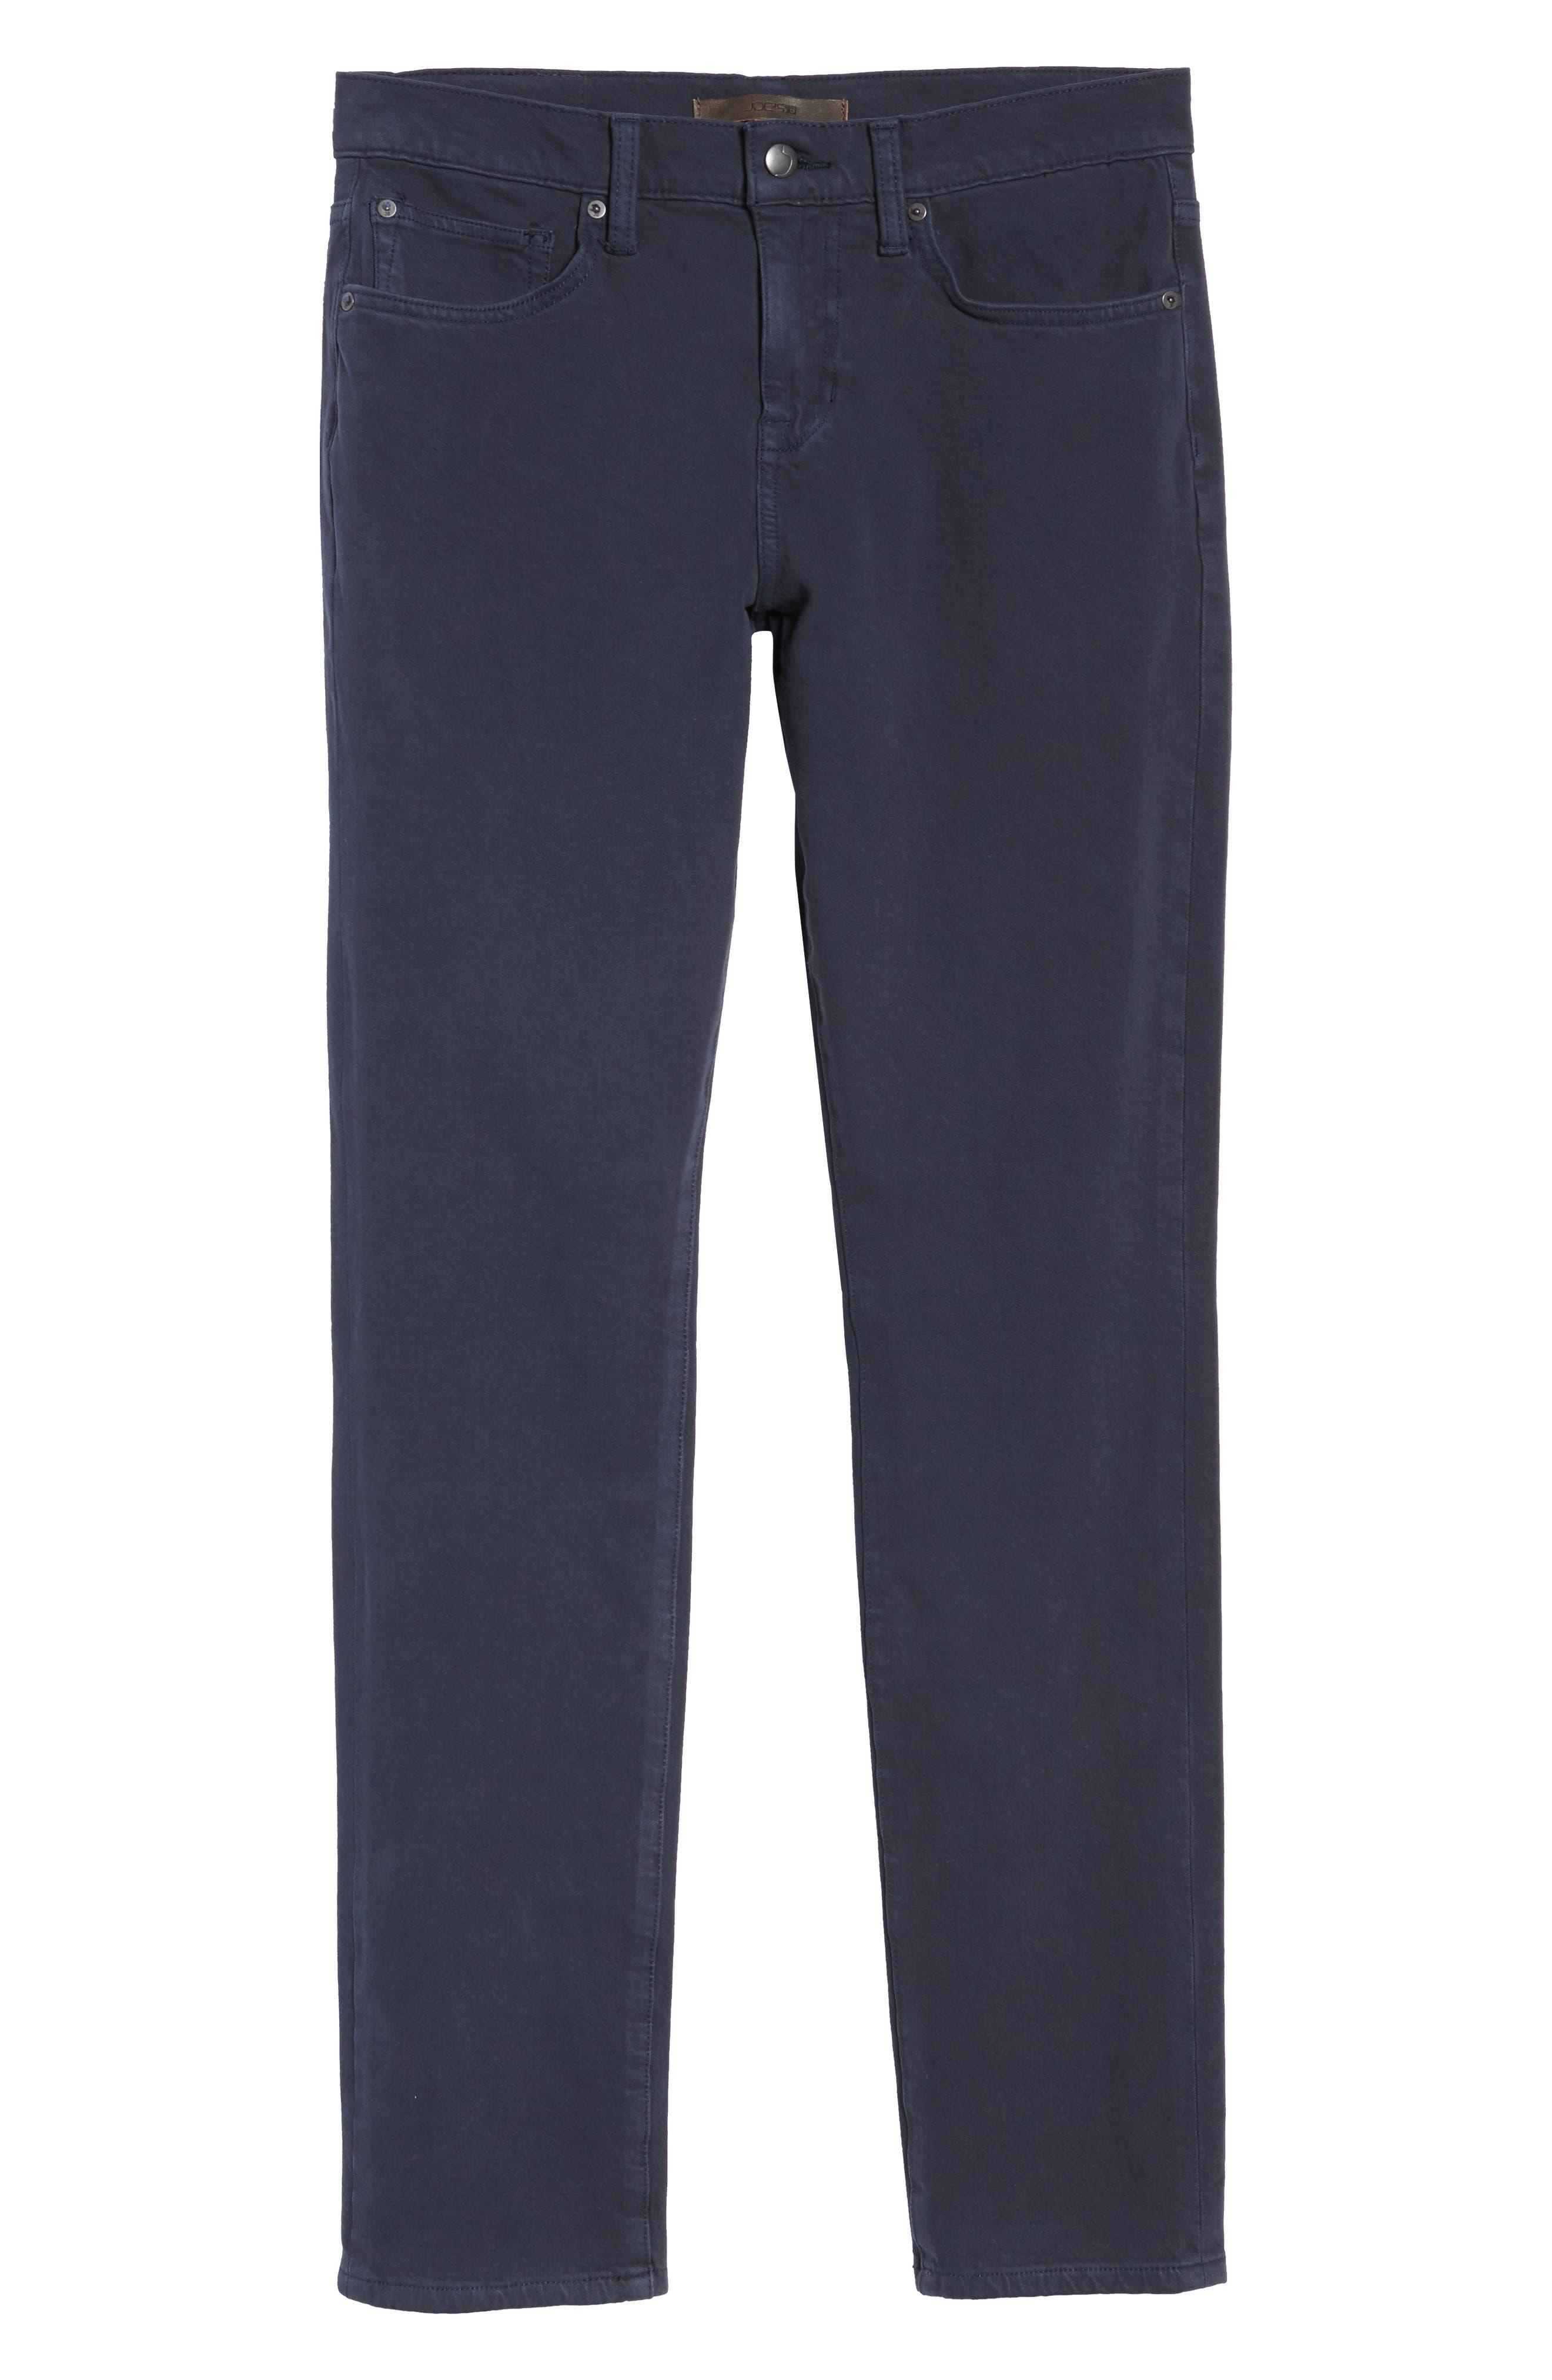 Kinetic Slim Fit Twill Pants,                             Alternate thumbnail 6, color,                             NAVY